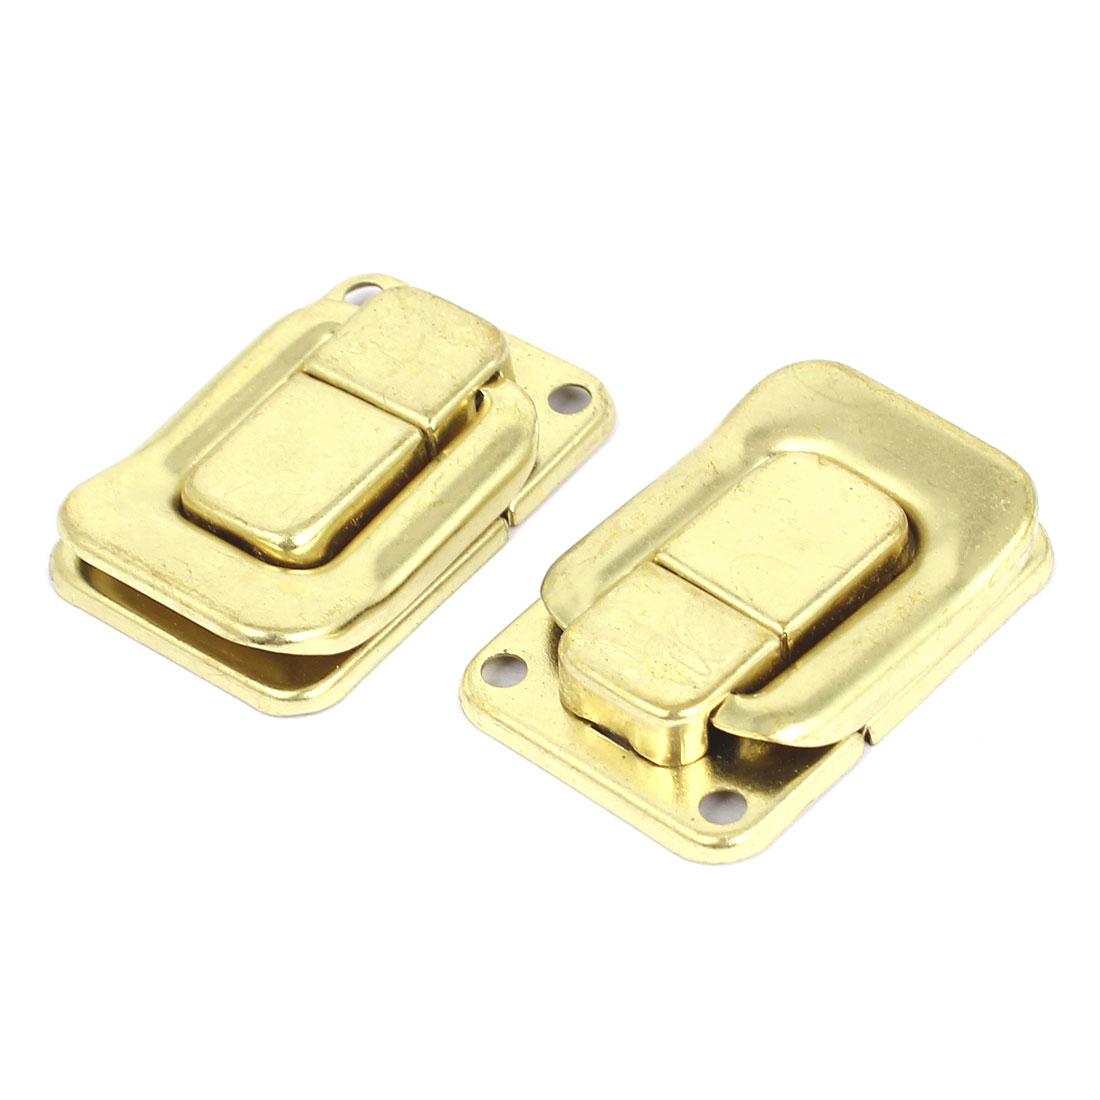 2 Pcs Gold Tone Toggle Latch Catch Chest Flight Case Suitcase Box Clasps 40x27mm